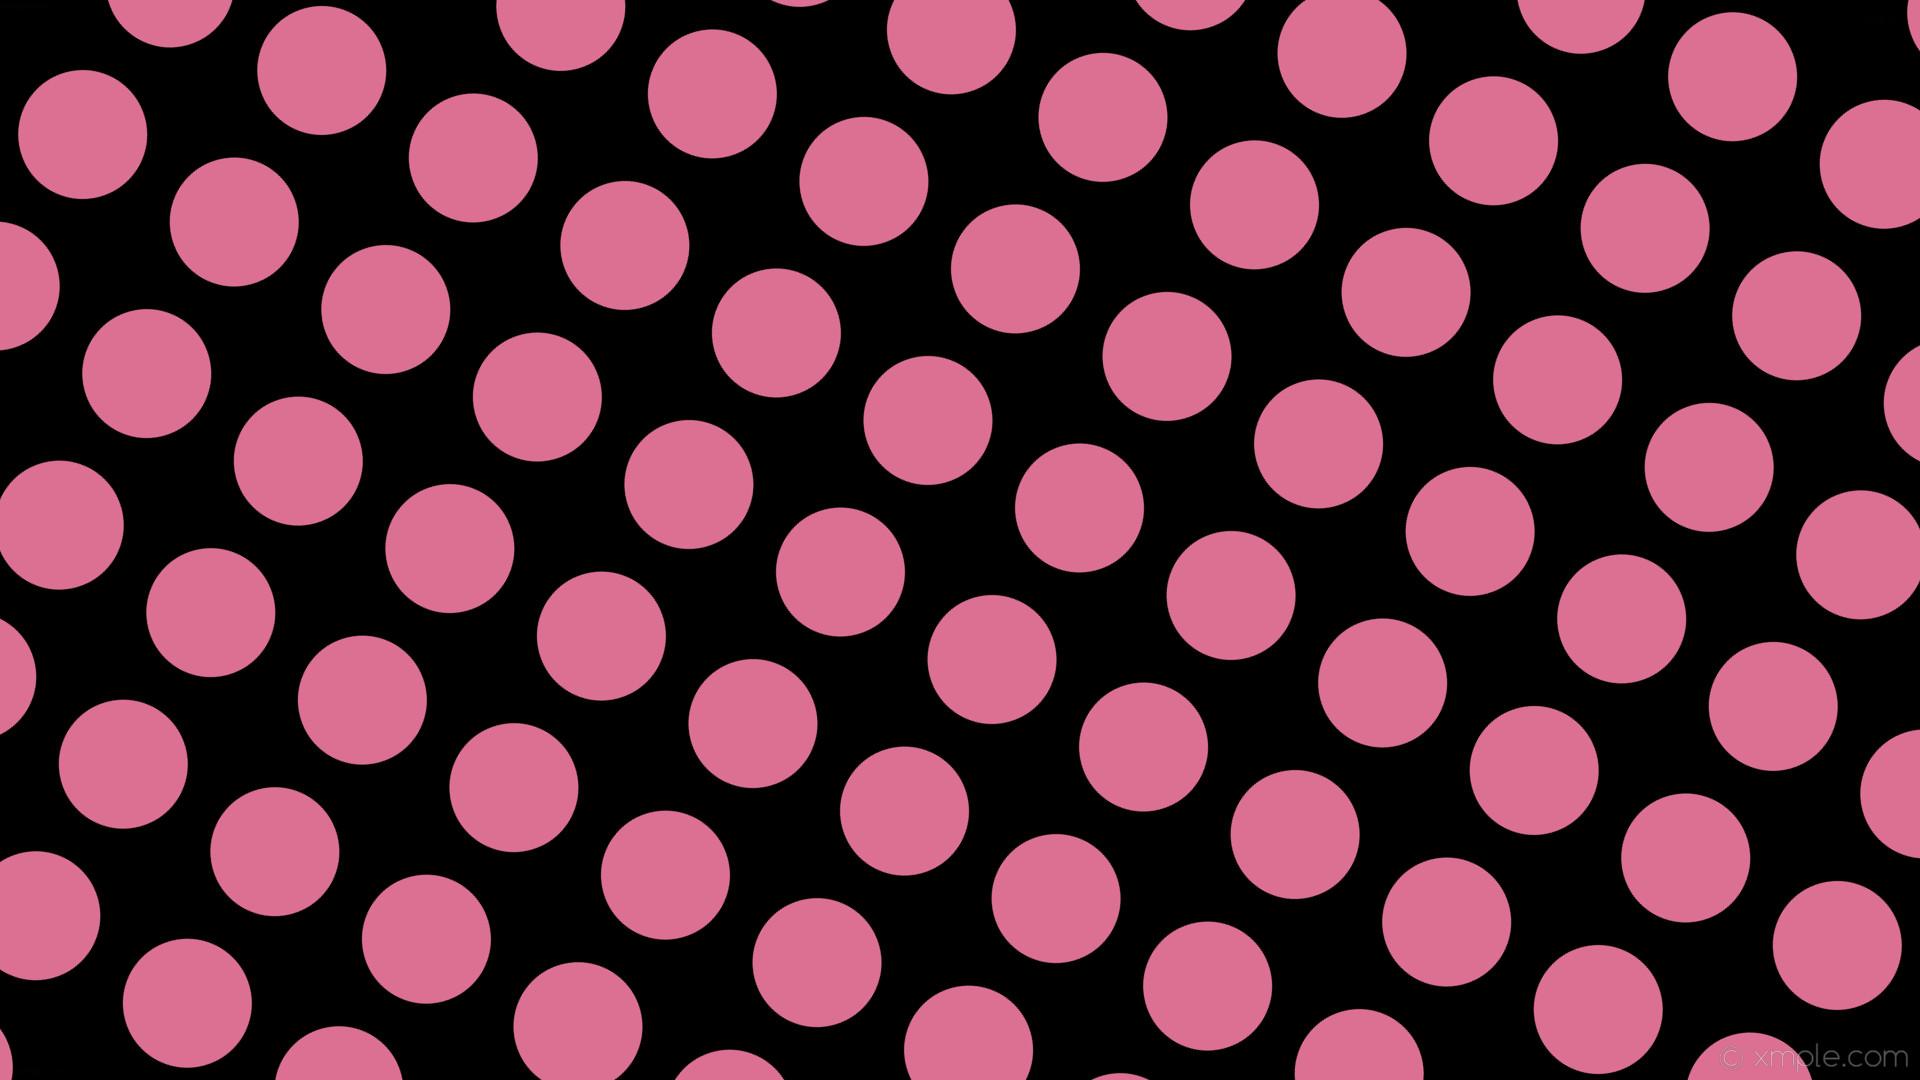 wallpaper dots black spots pink polka pale violet red #000000 #db7093 60°  129px